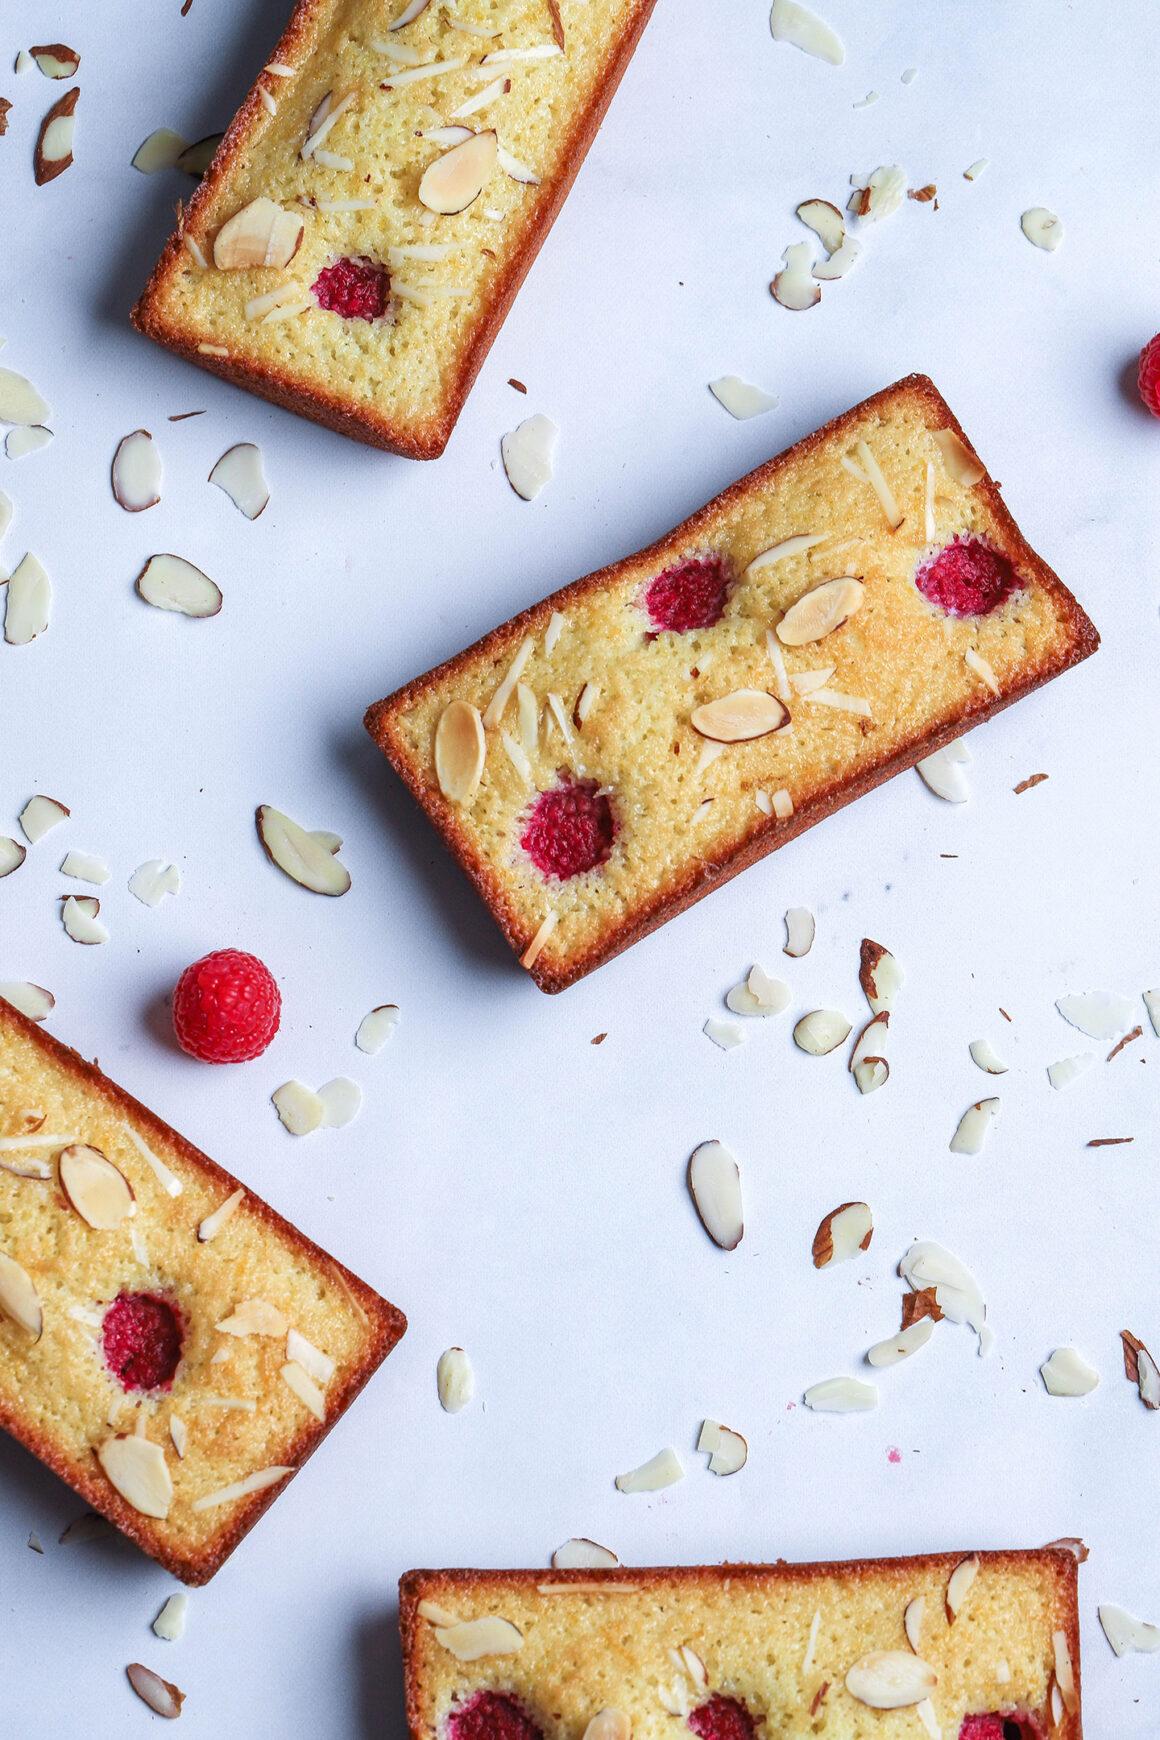 raspberry almond financiers on marble counter